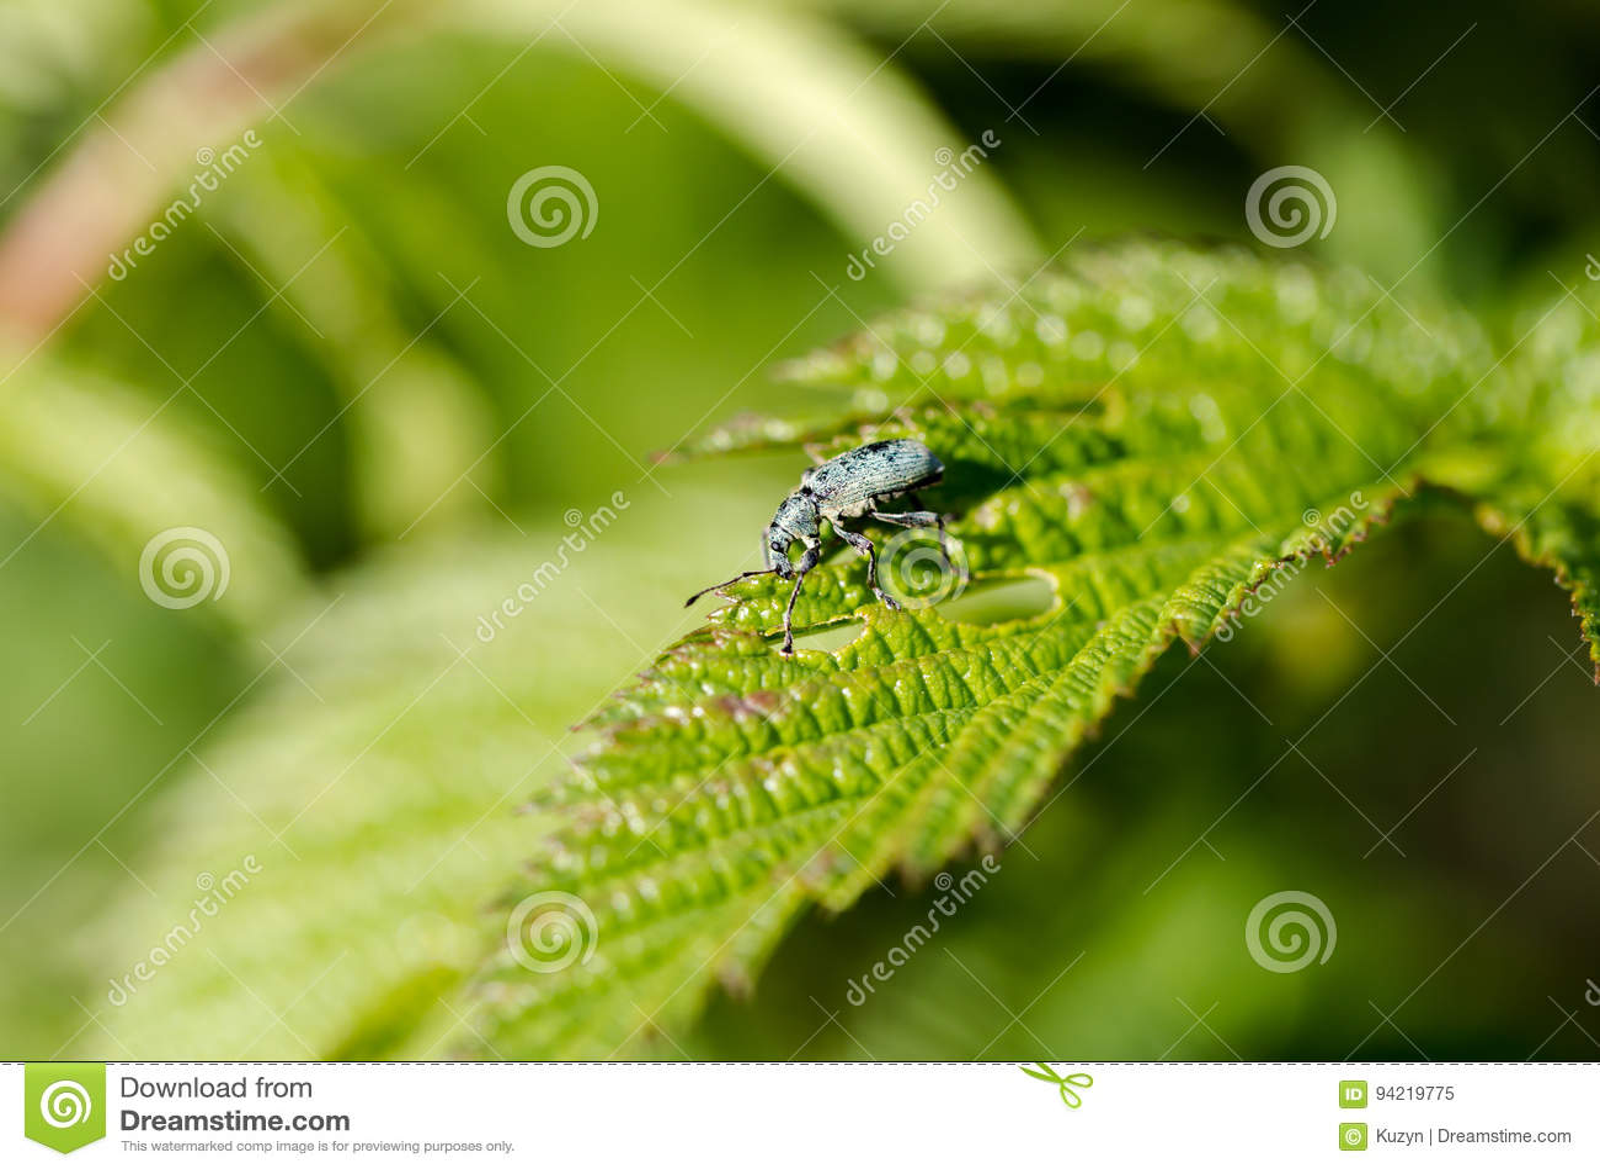 Il parassita del giardino, Otiorhynchus, mangia la foglia verde, macro